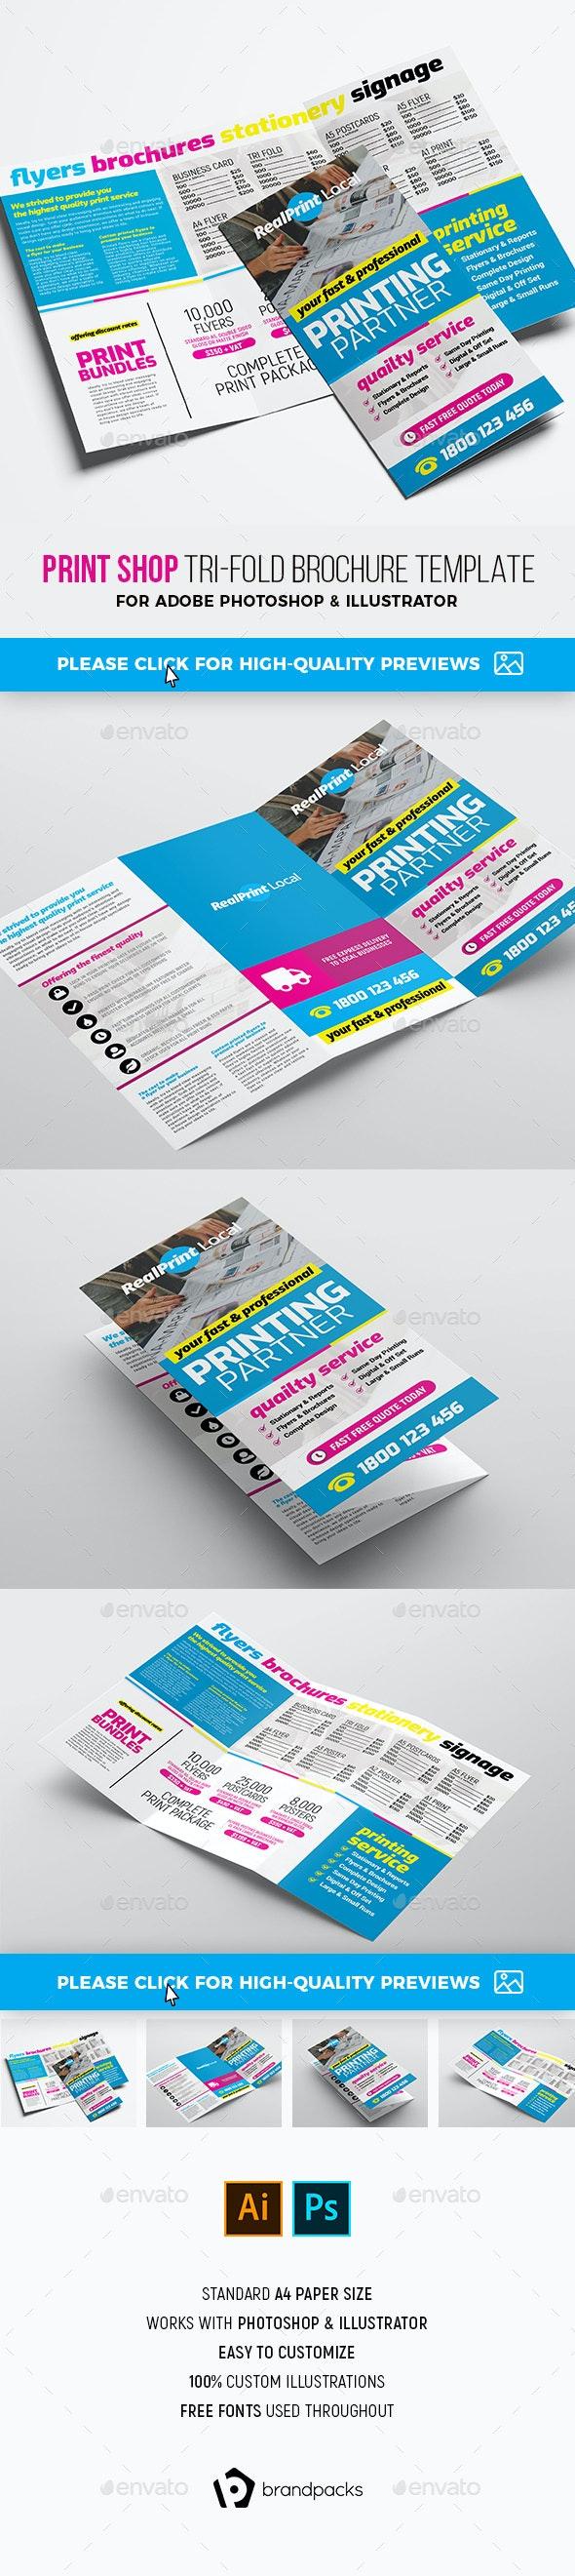 Print Shop Tri-Fold Brochure - Corporate Brochures